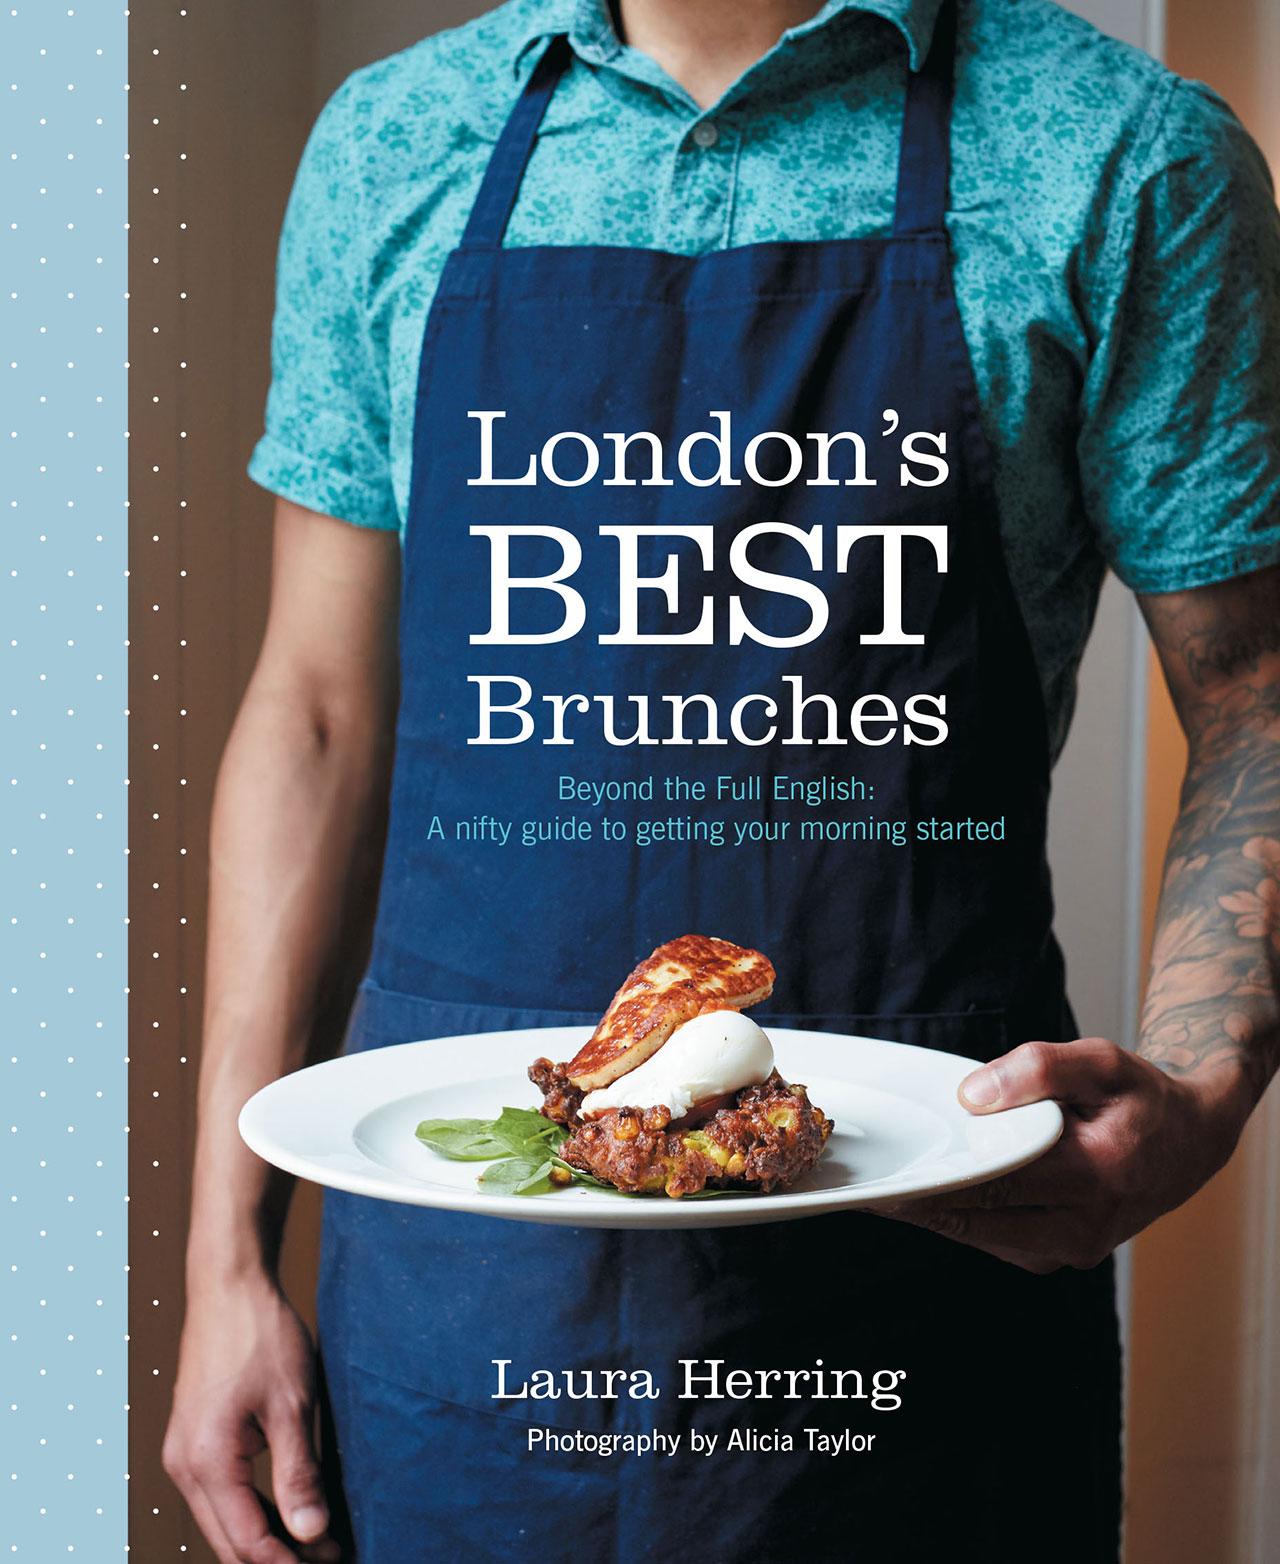 LondonsBestBrunches